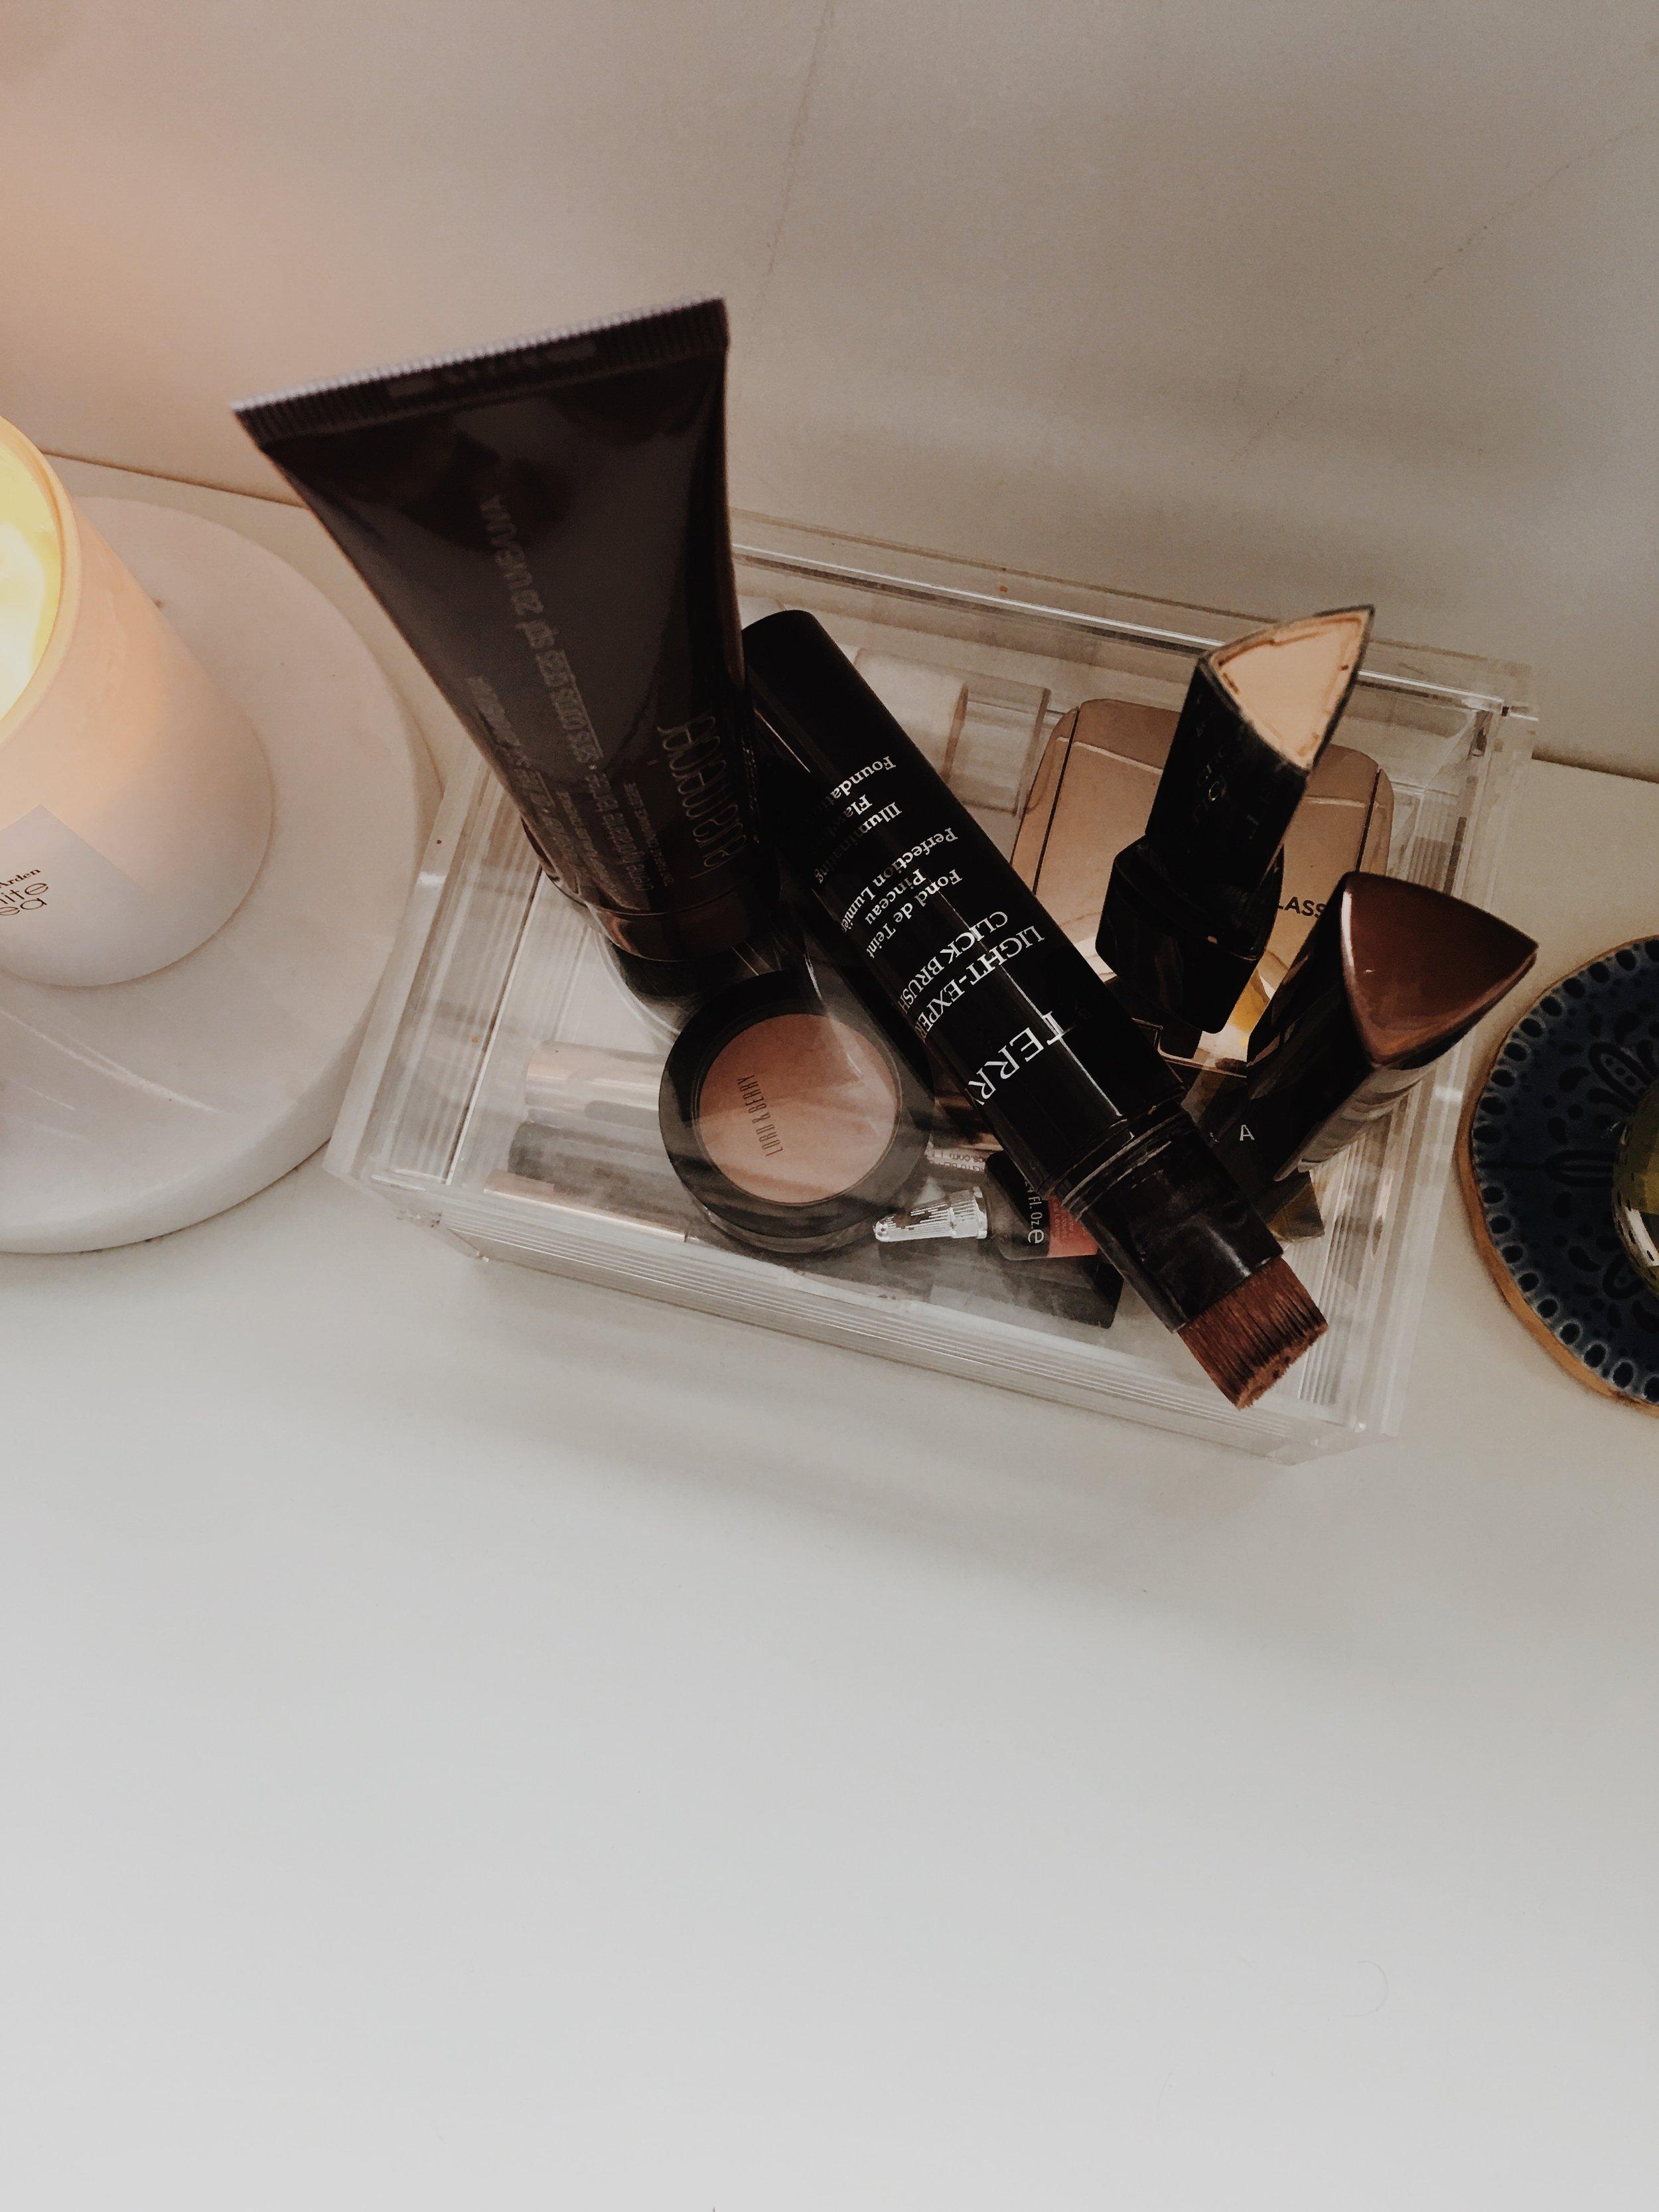 TOP 3: Foundations Jasmine Harding Makeup